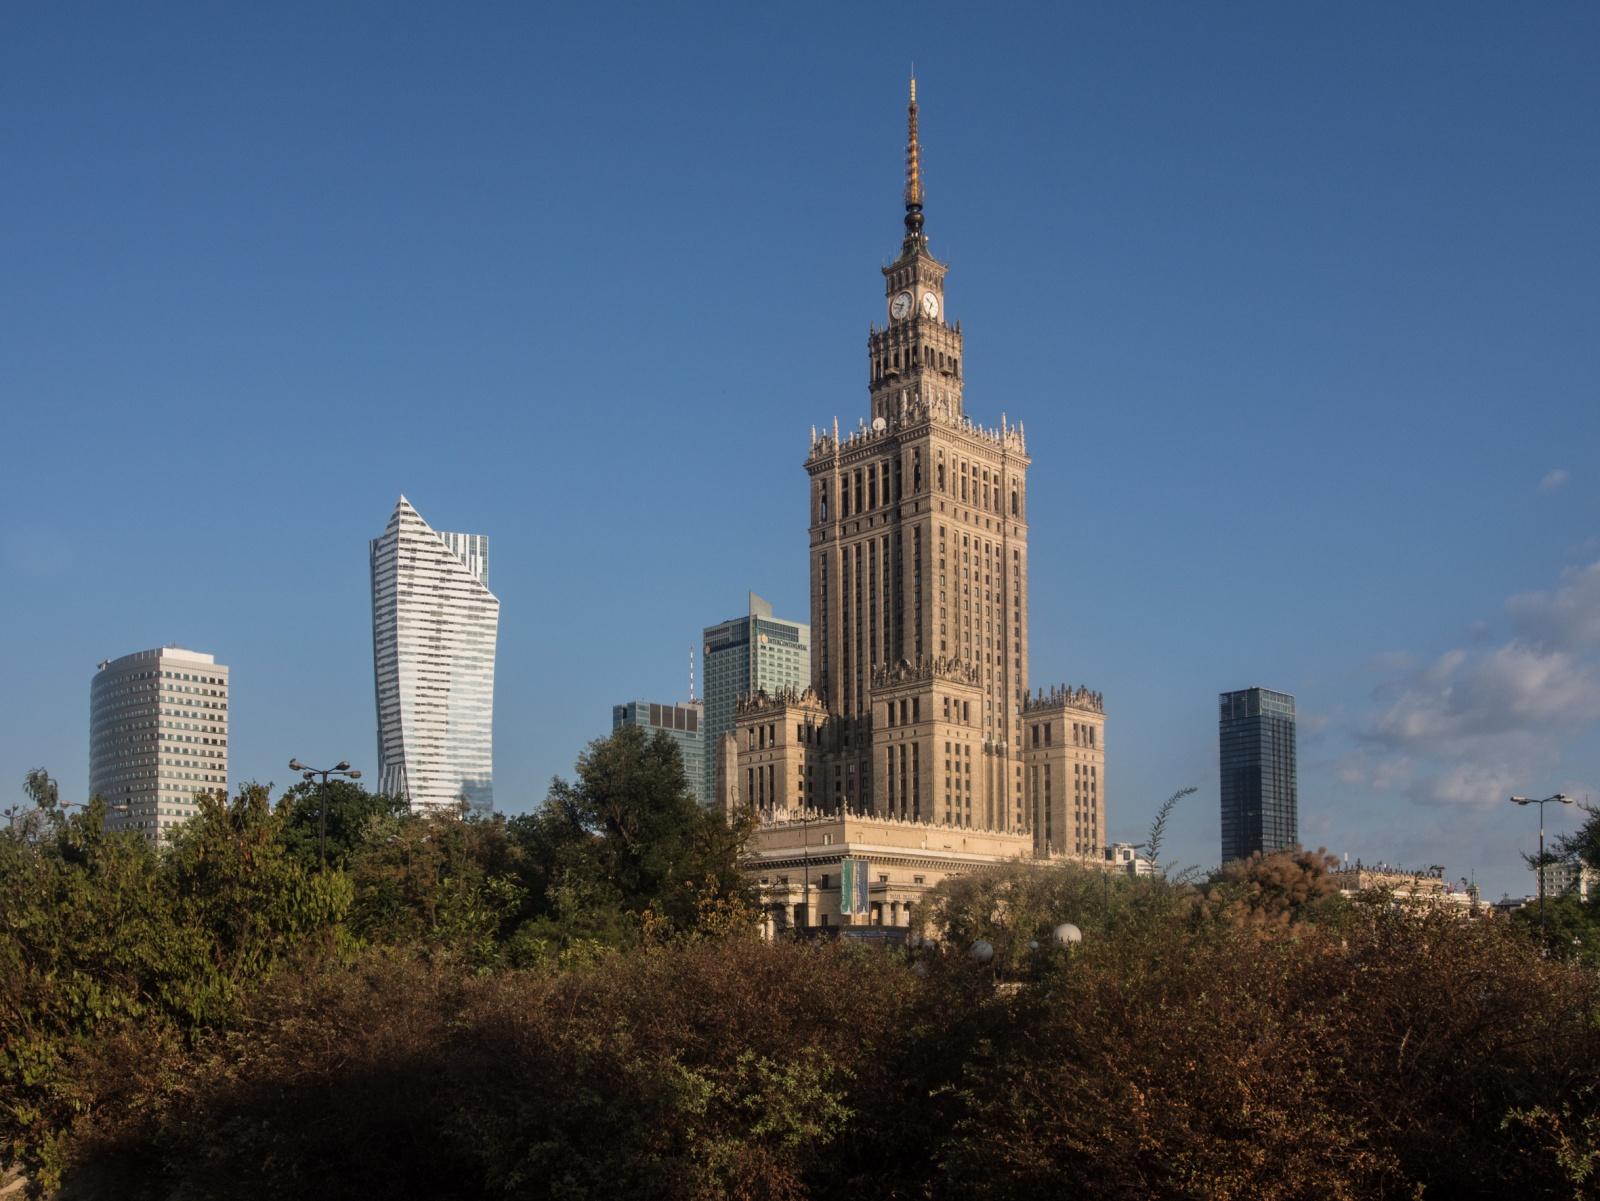 PKiN, POLAND - AUGUST 2015